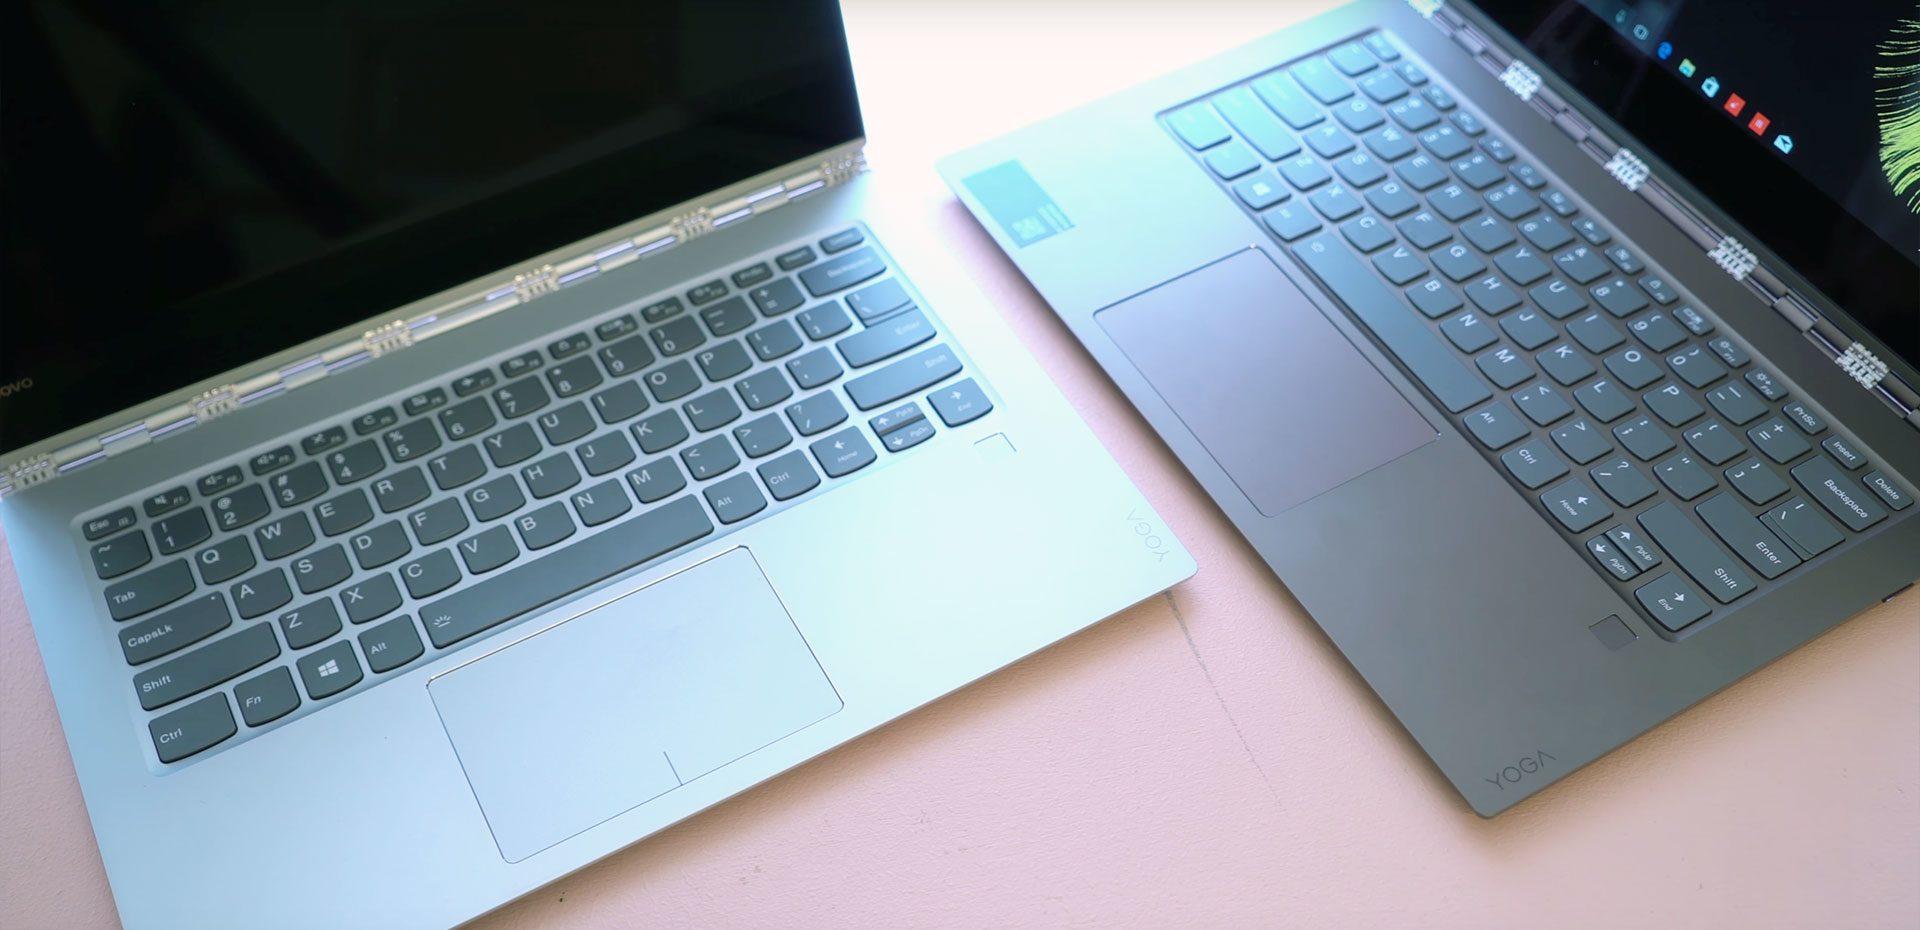 Lenovo Yoga 920 - 13IKB reviewed (w/ Core i5-8250U, UHD 620) - how